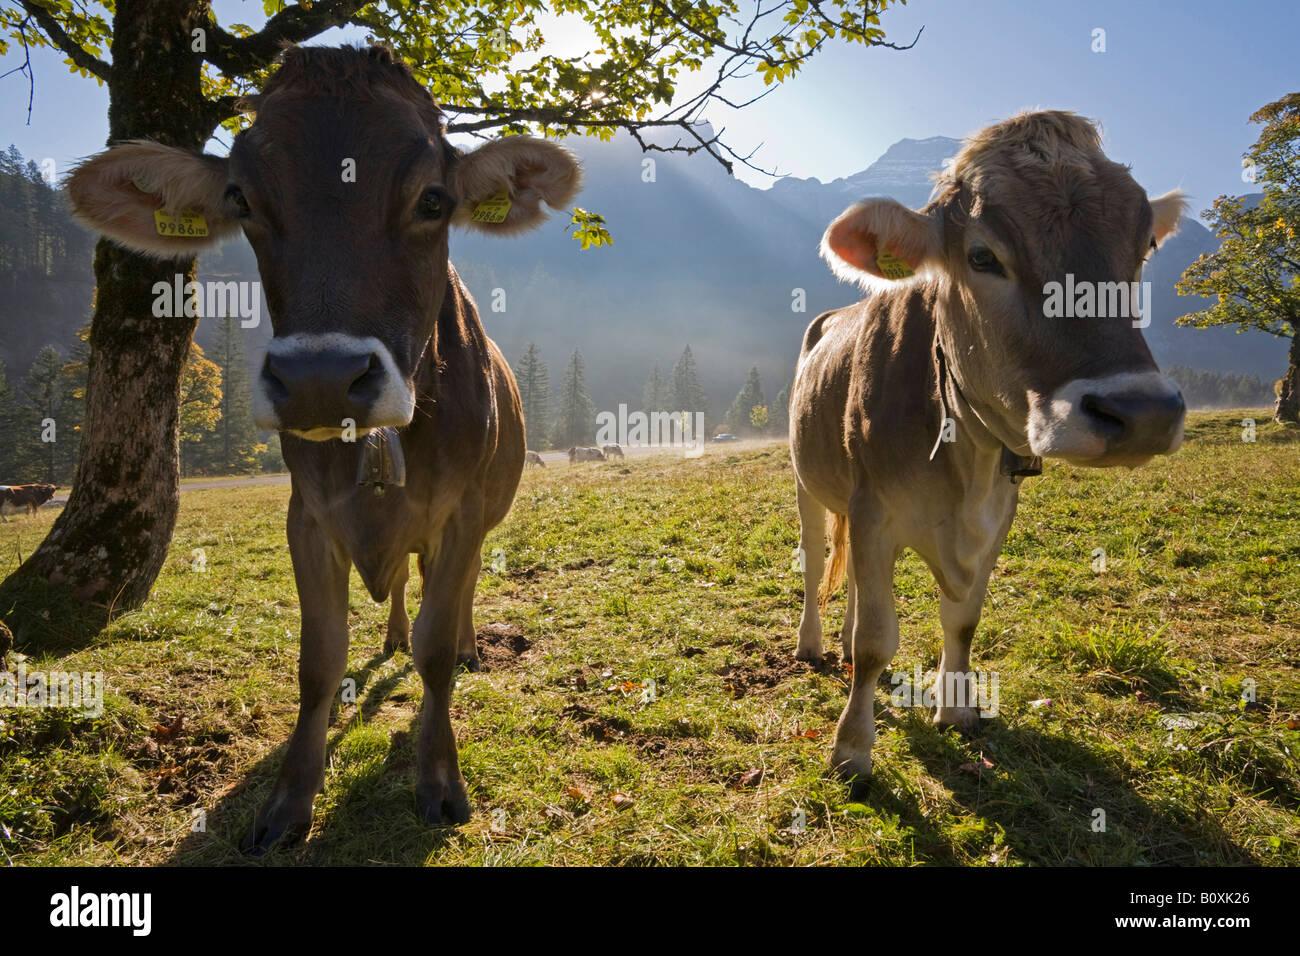 Austria, Tirol, Karwendel, Calfs on pasture - Stock Image